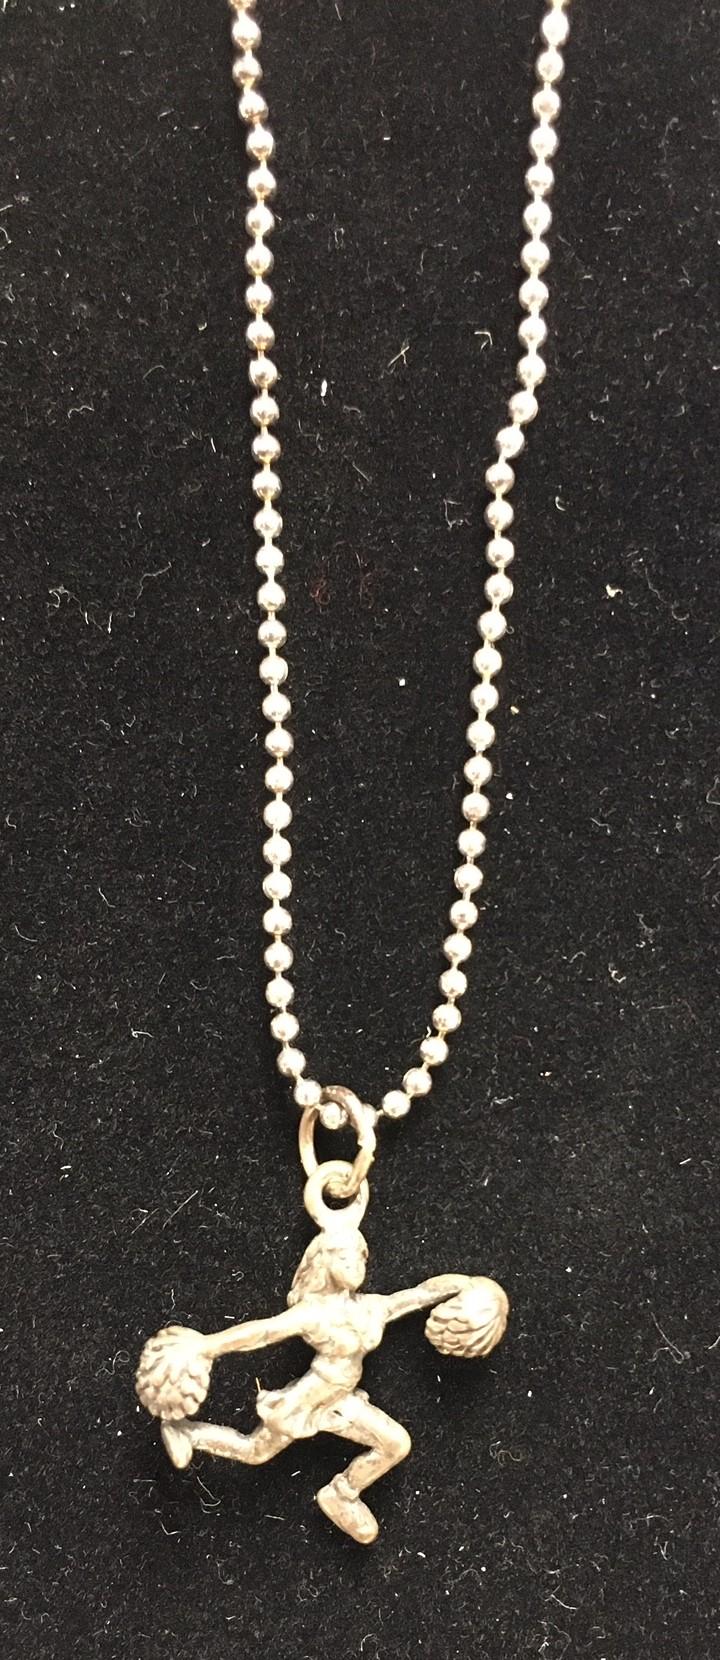 Barry's Cheerleader/Pom Necklace